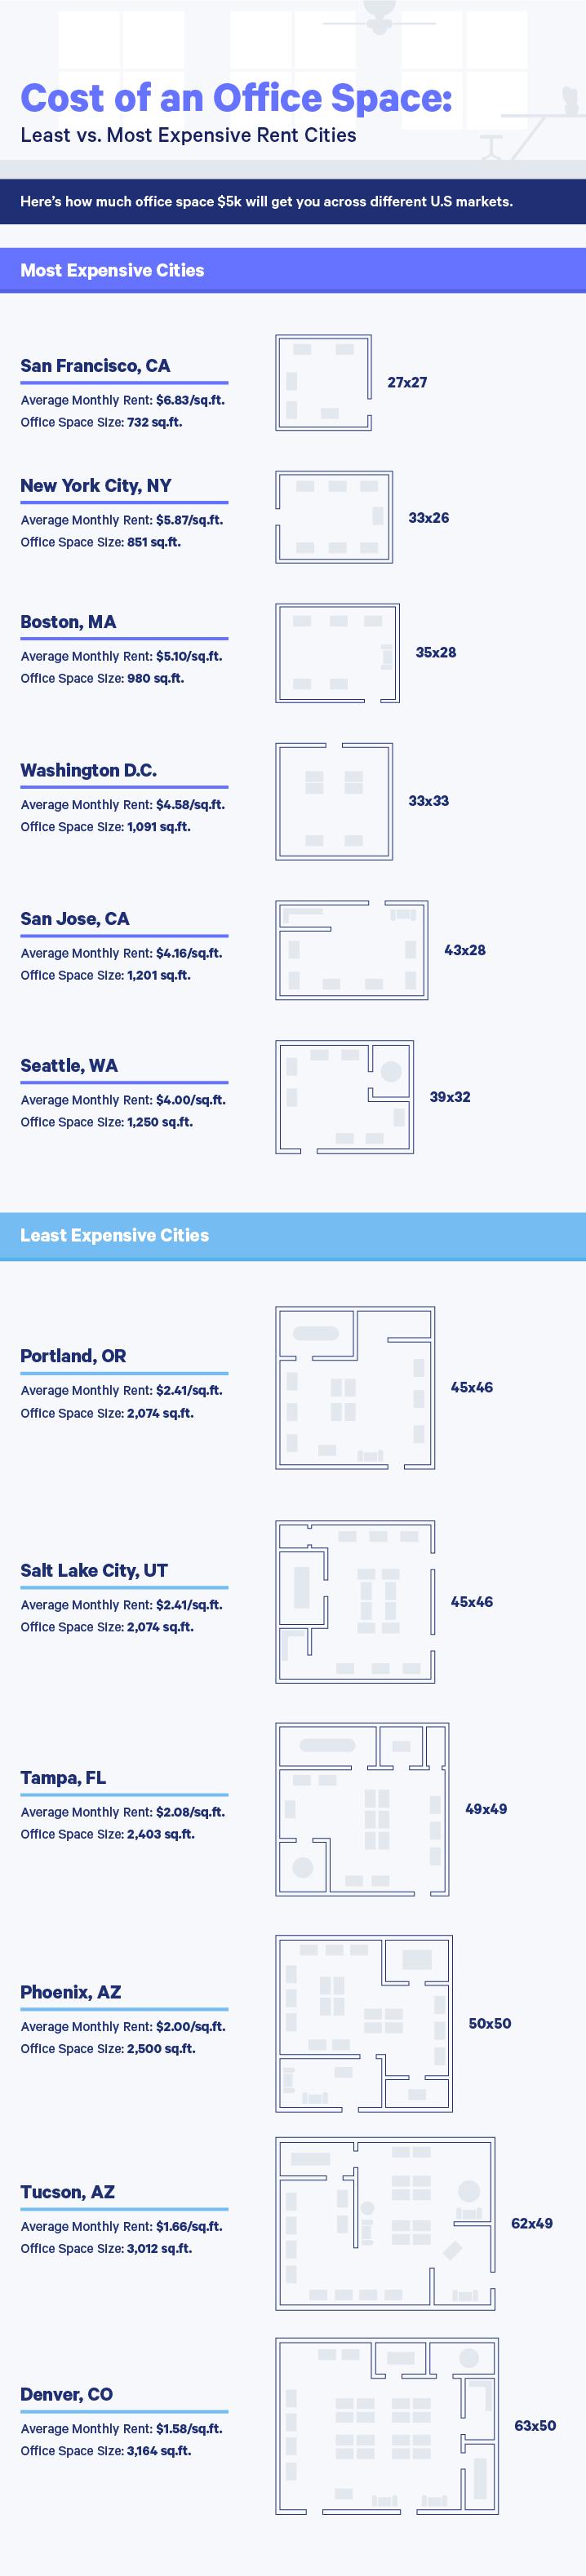 Cost of office rent in major cities